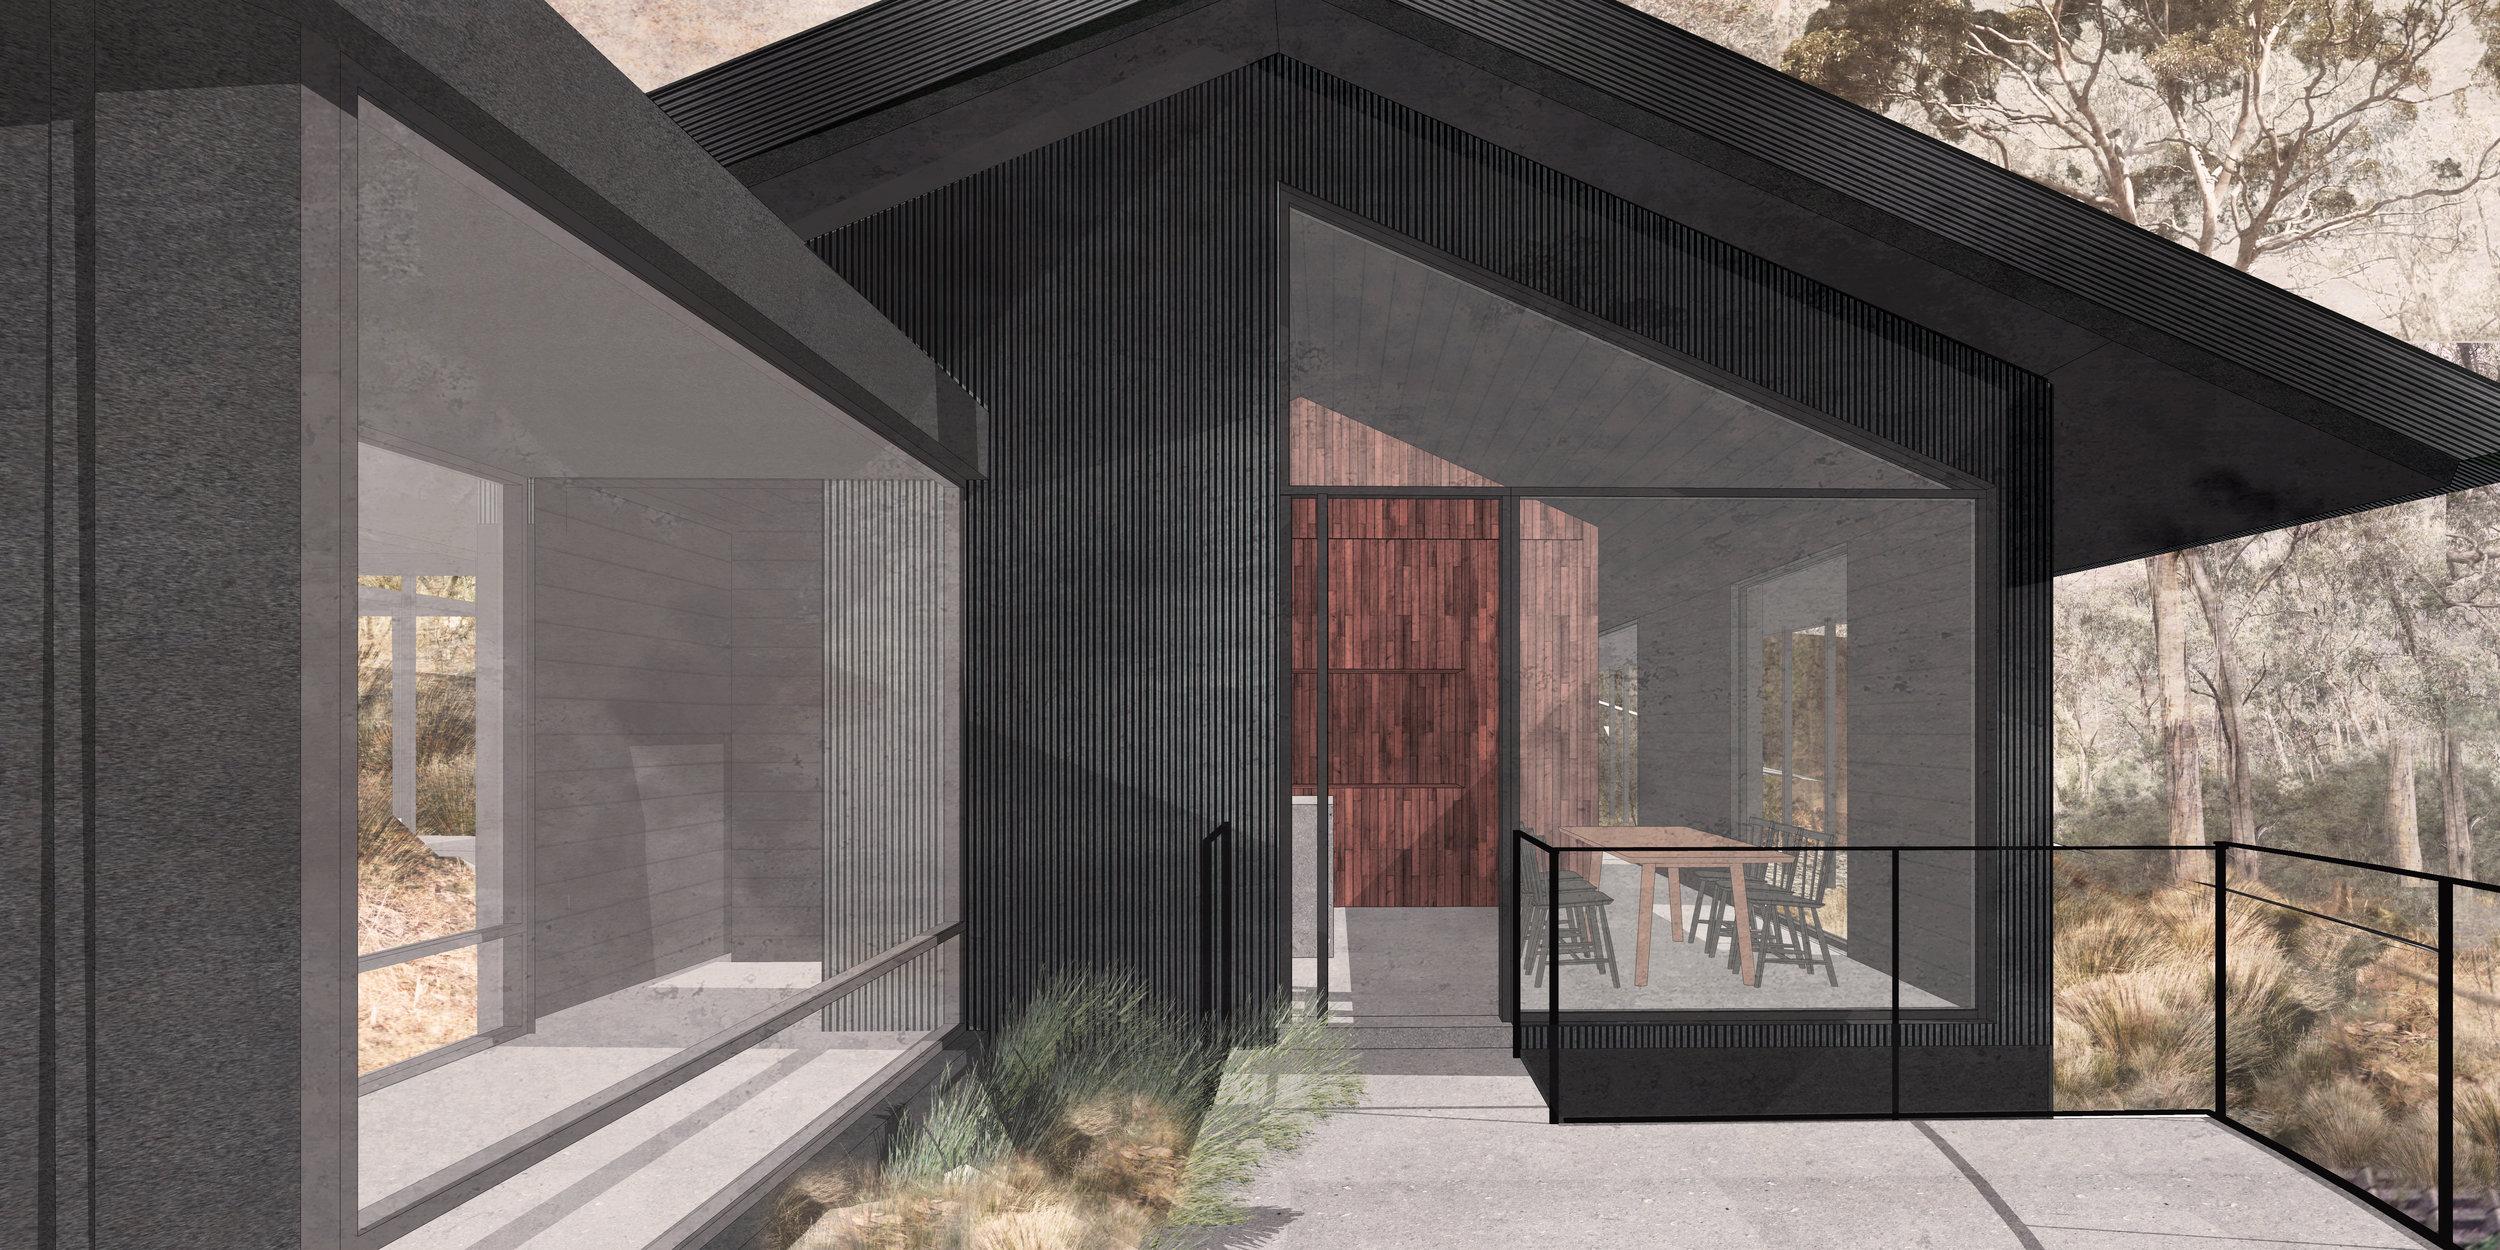 Dreamer_Architecture_interior_Lorne__Design_twosheds_05.jpg